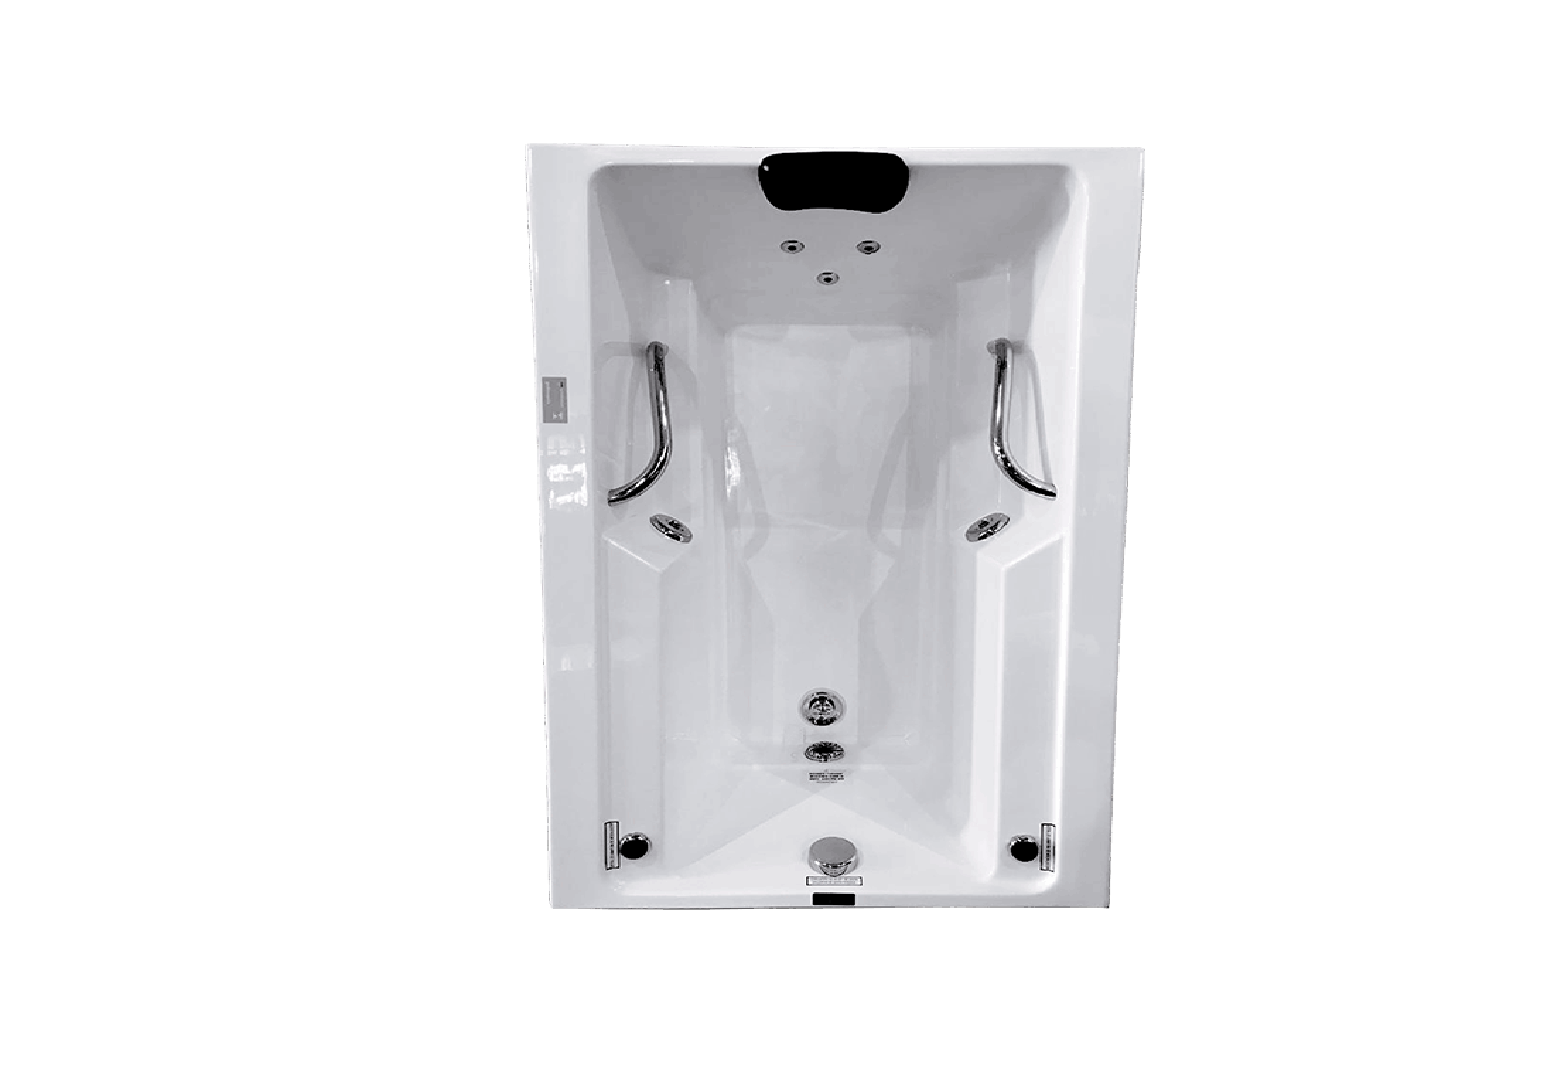 Banheira Hidro Rubi IV COMPLETA - Jato de Hidro, LED (1,20x0,80)